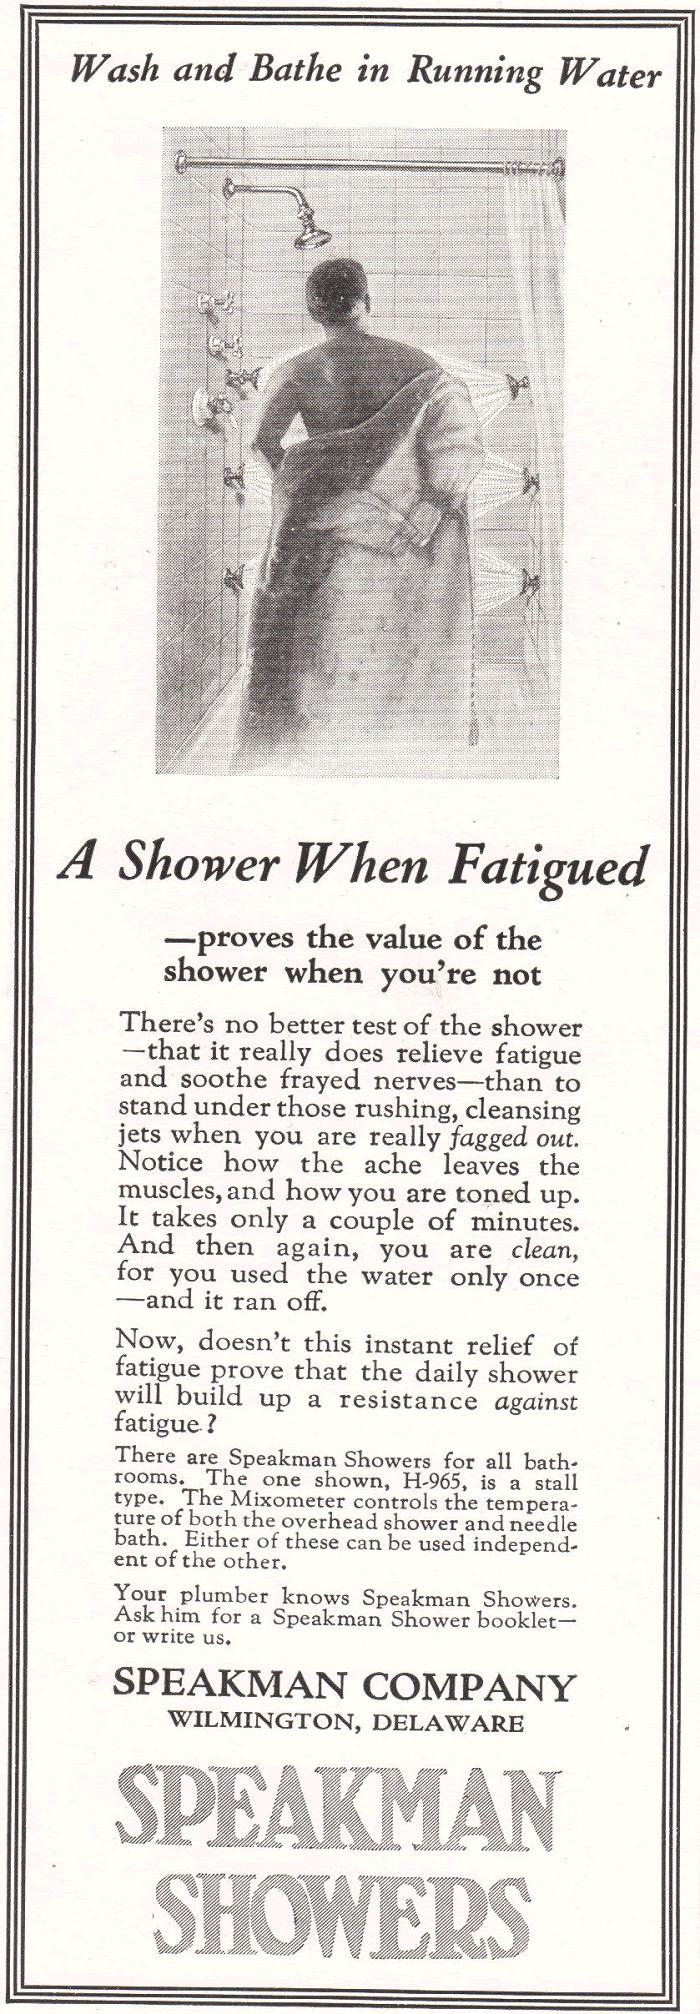 Speakman Showers Advertisement from 1922